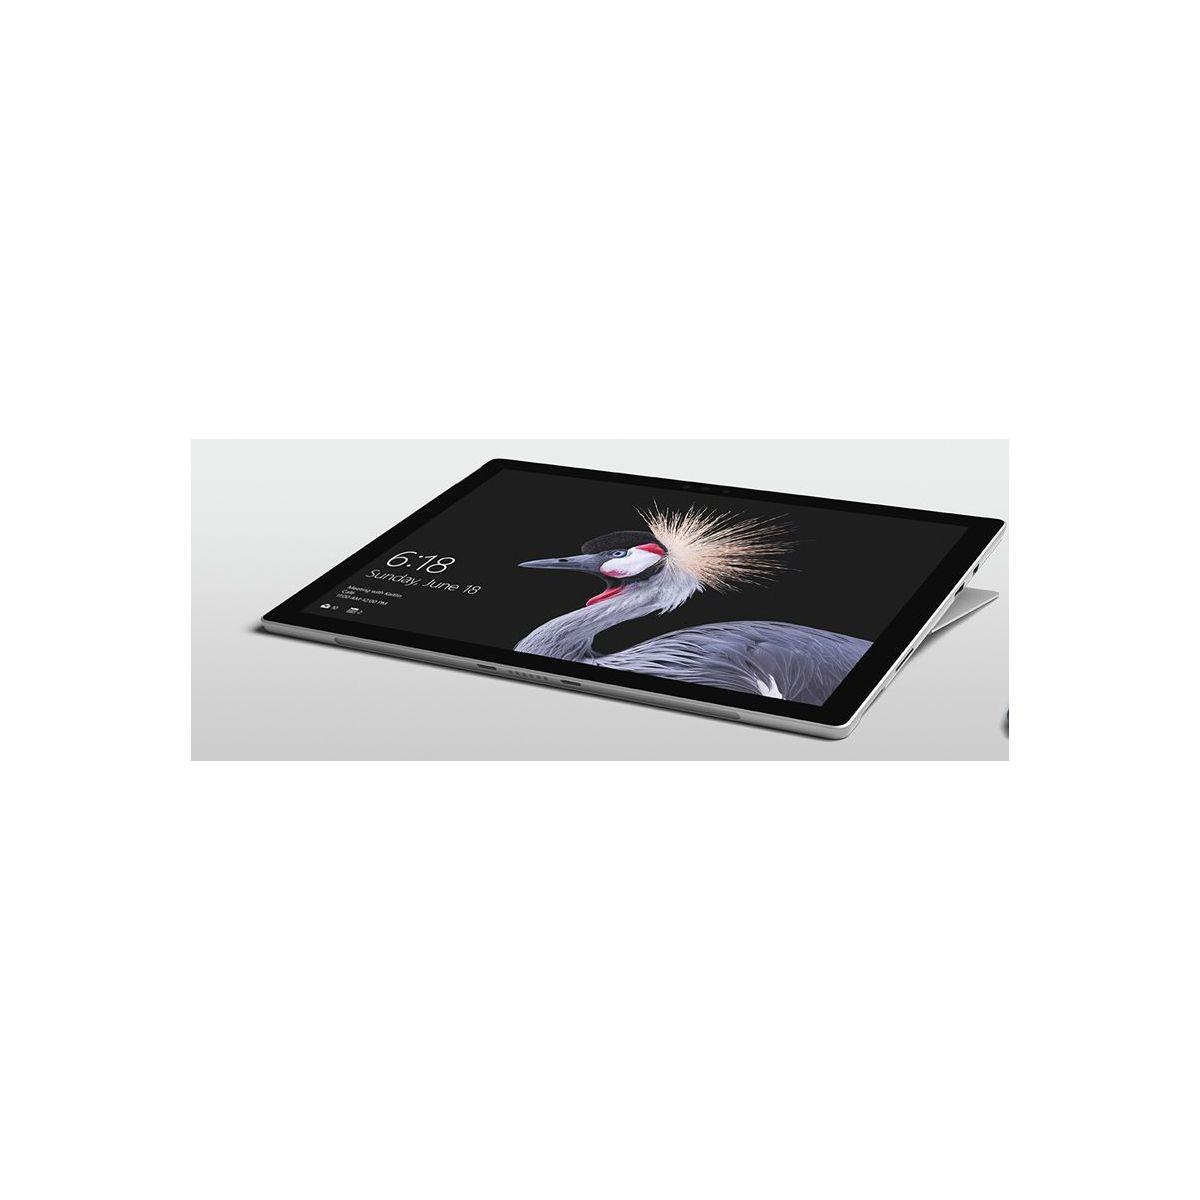 Ordi microsoft surface studio i5 8go 1to (photo)